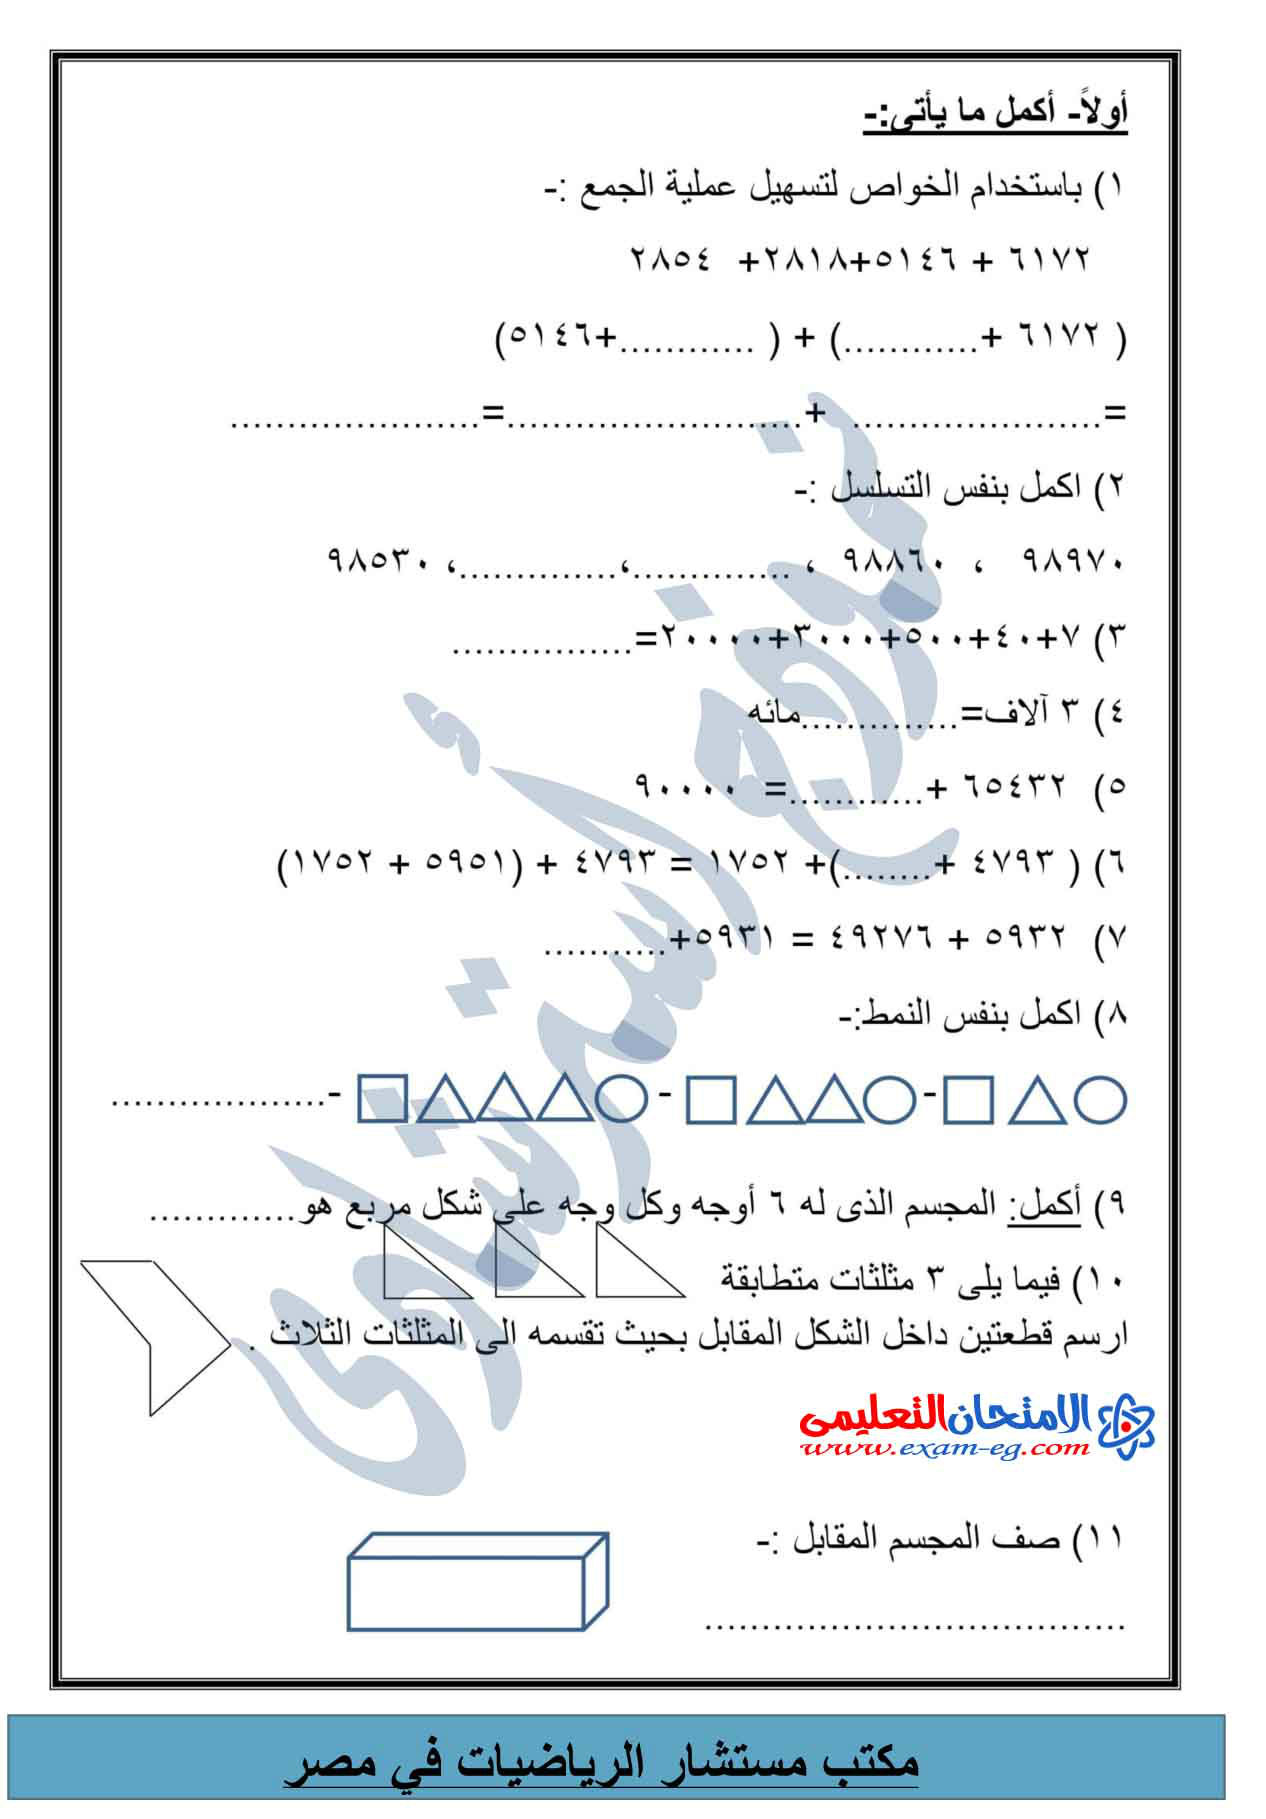 exam-eg.com_1449242034382.jpg